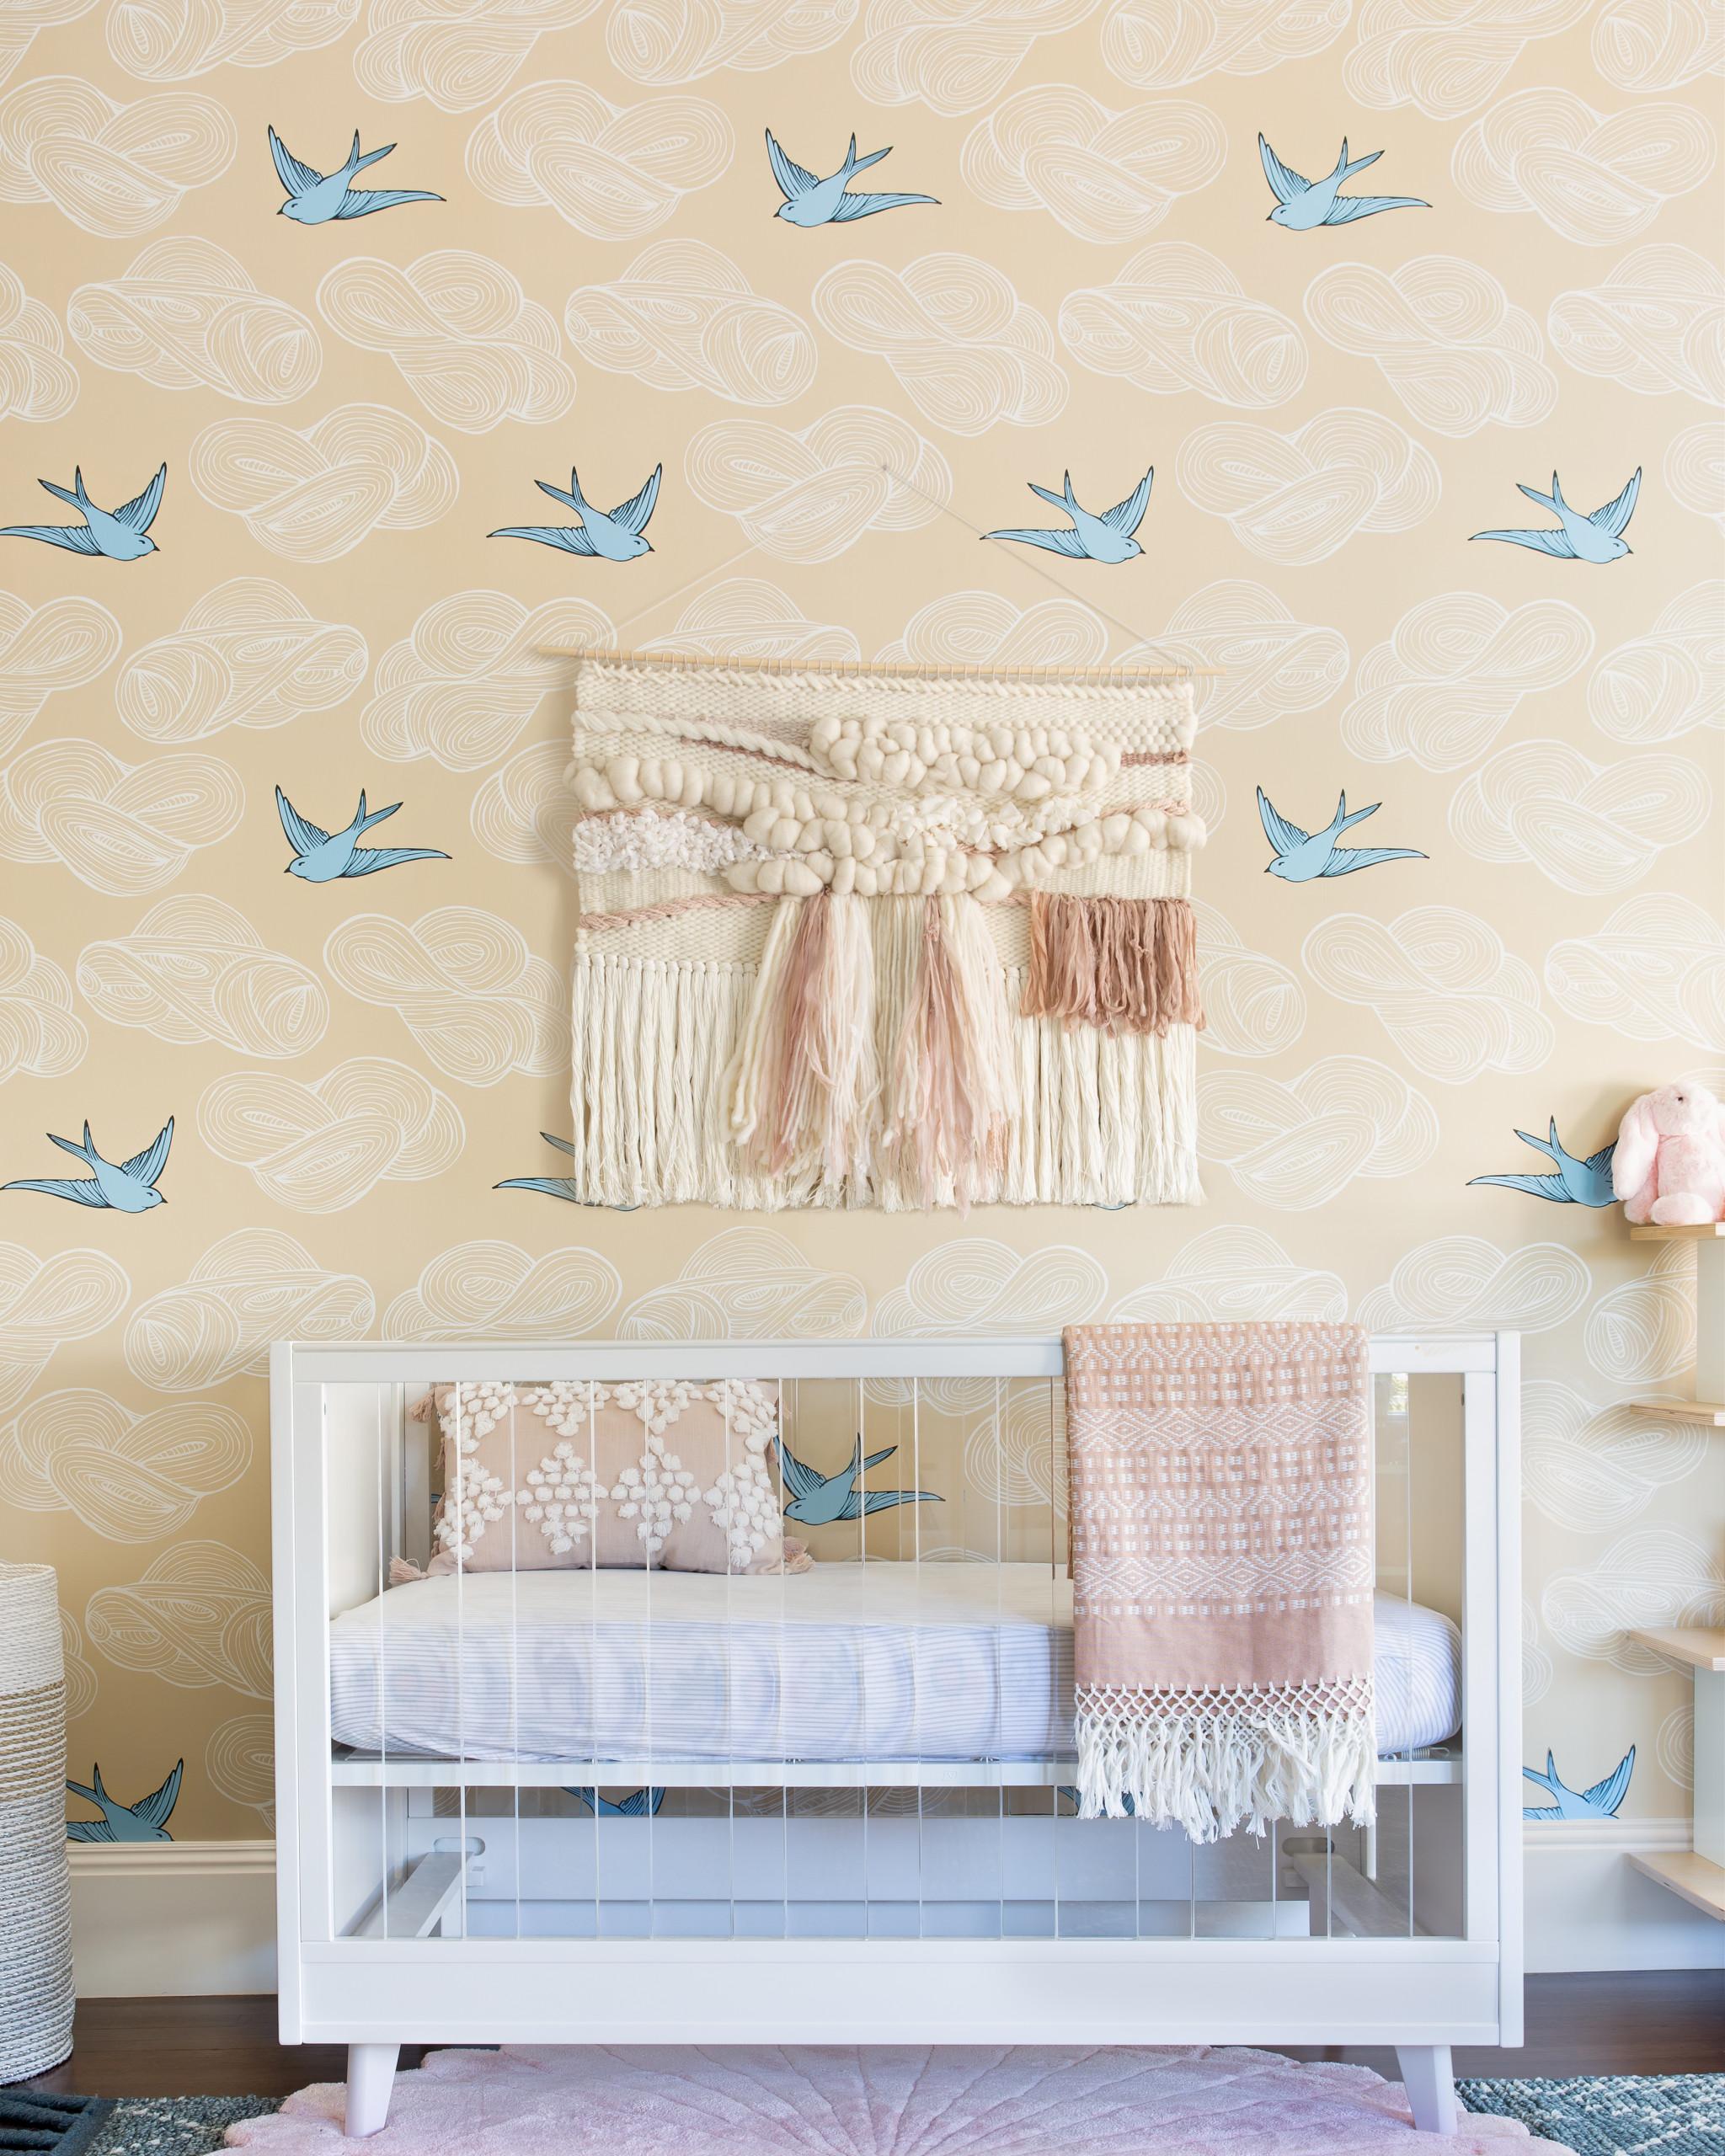 A popular wallpaper choice with bird print for the smart modern nursery